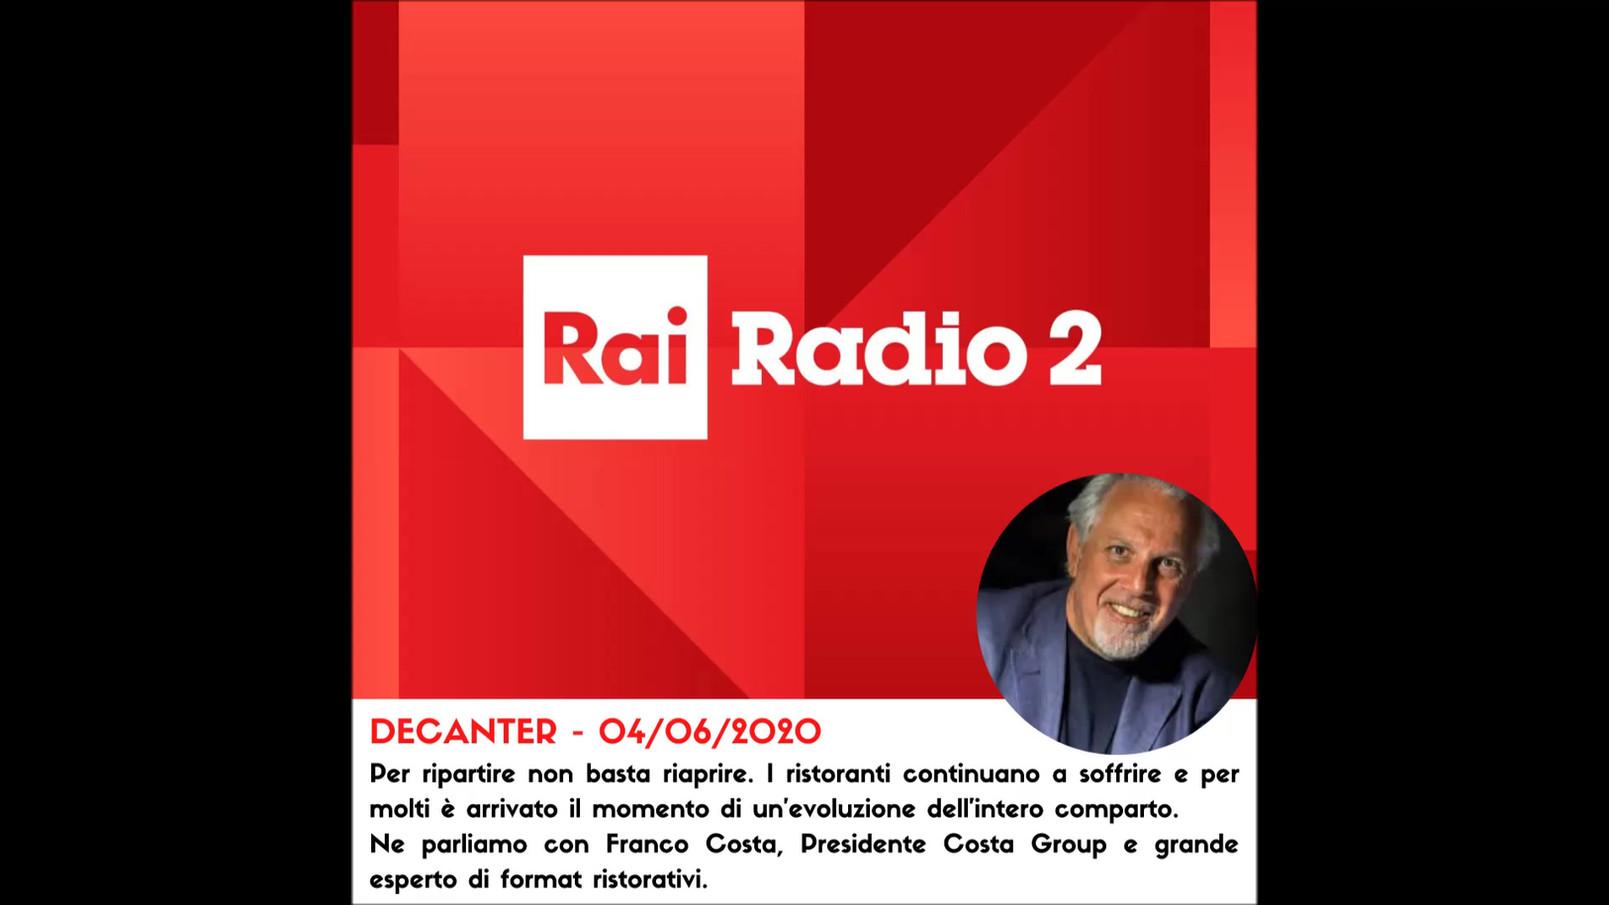 Radio 2 - Decanter